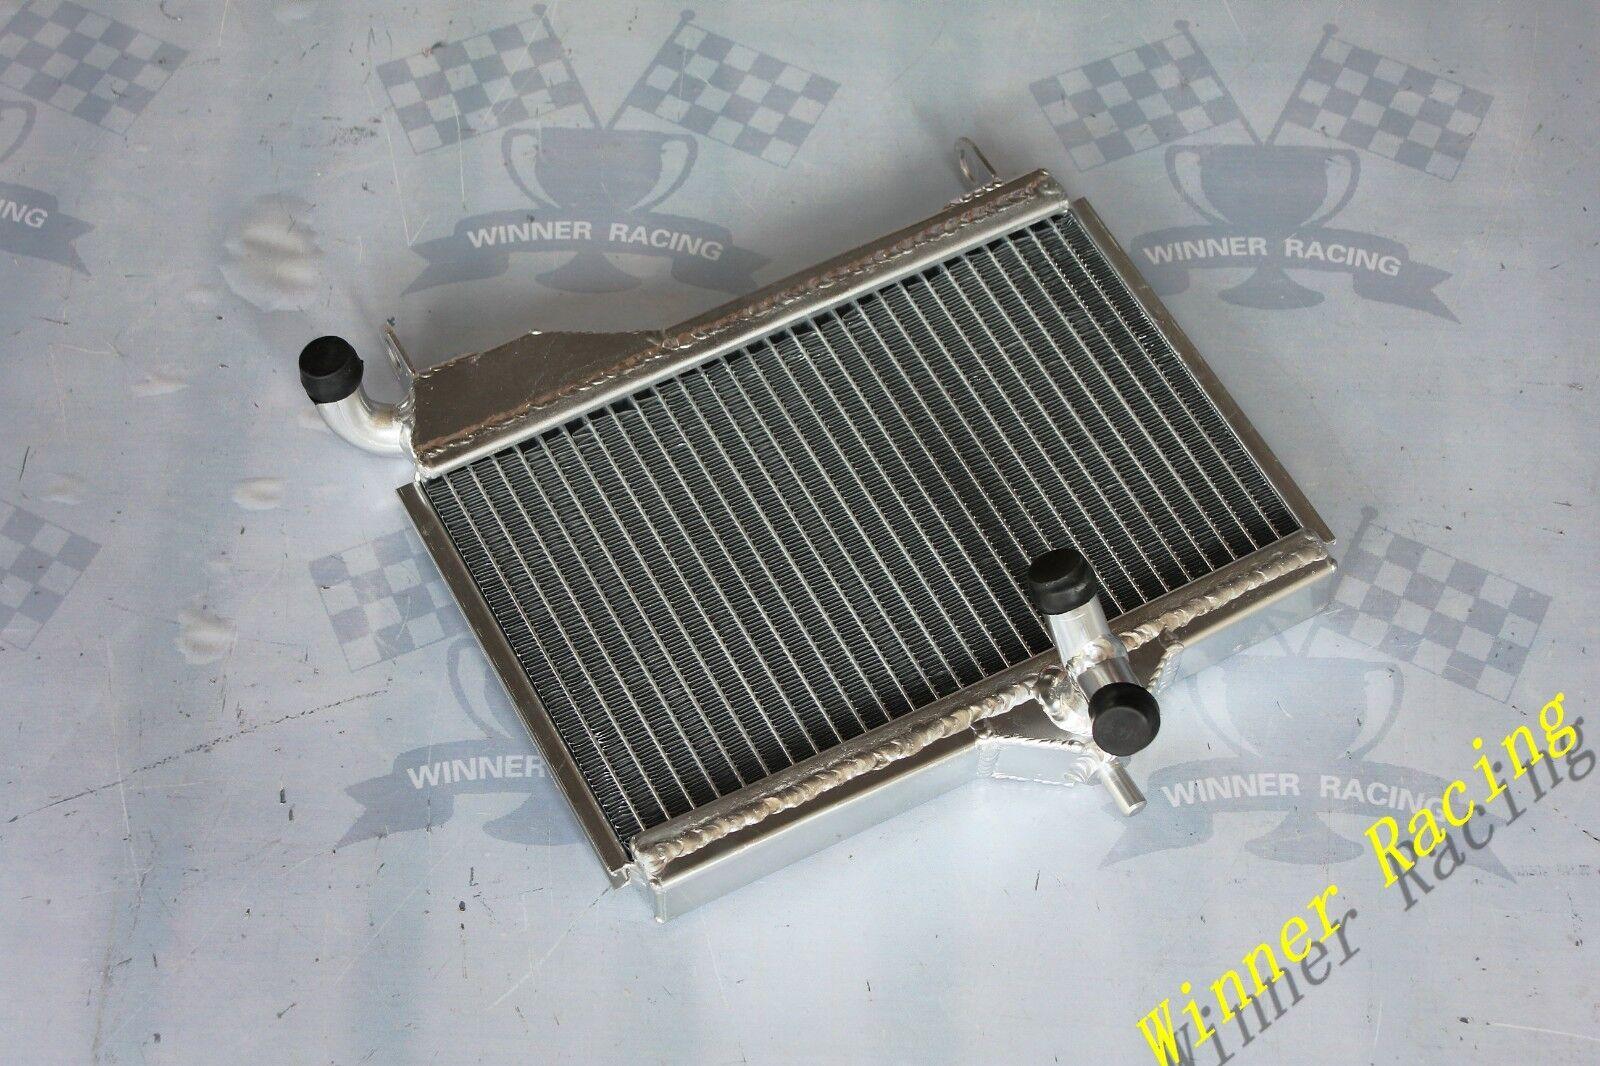 Yamaha RD350 YPVS 31K,Bj.83-84 Keyster Vergaser Dichtungssatz Reparatursatz,Kit